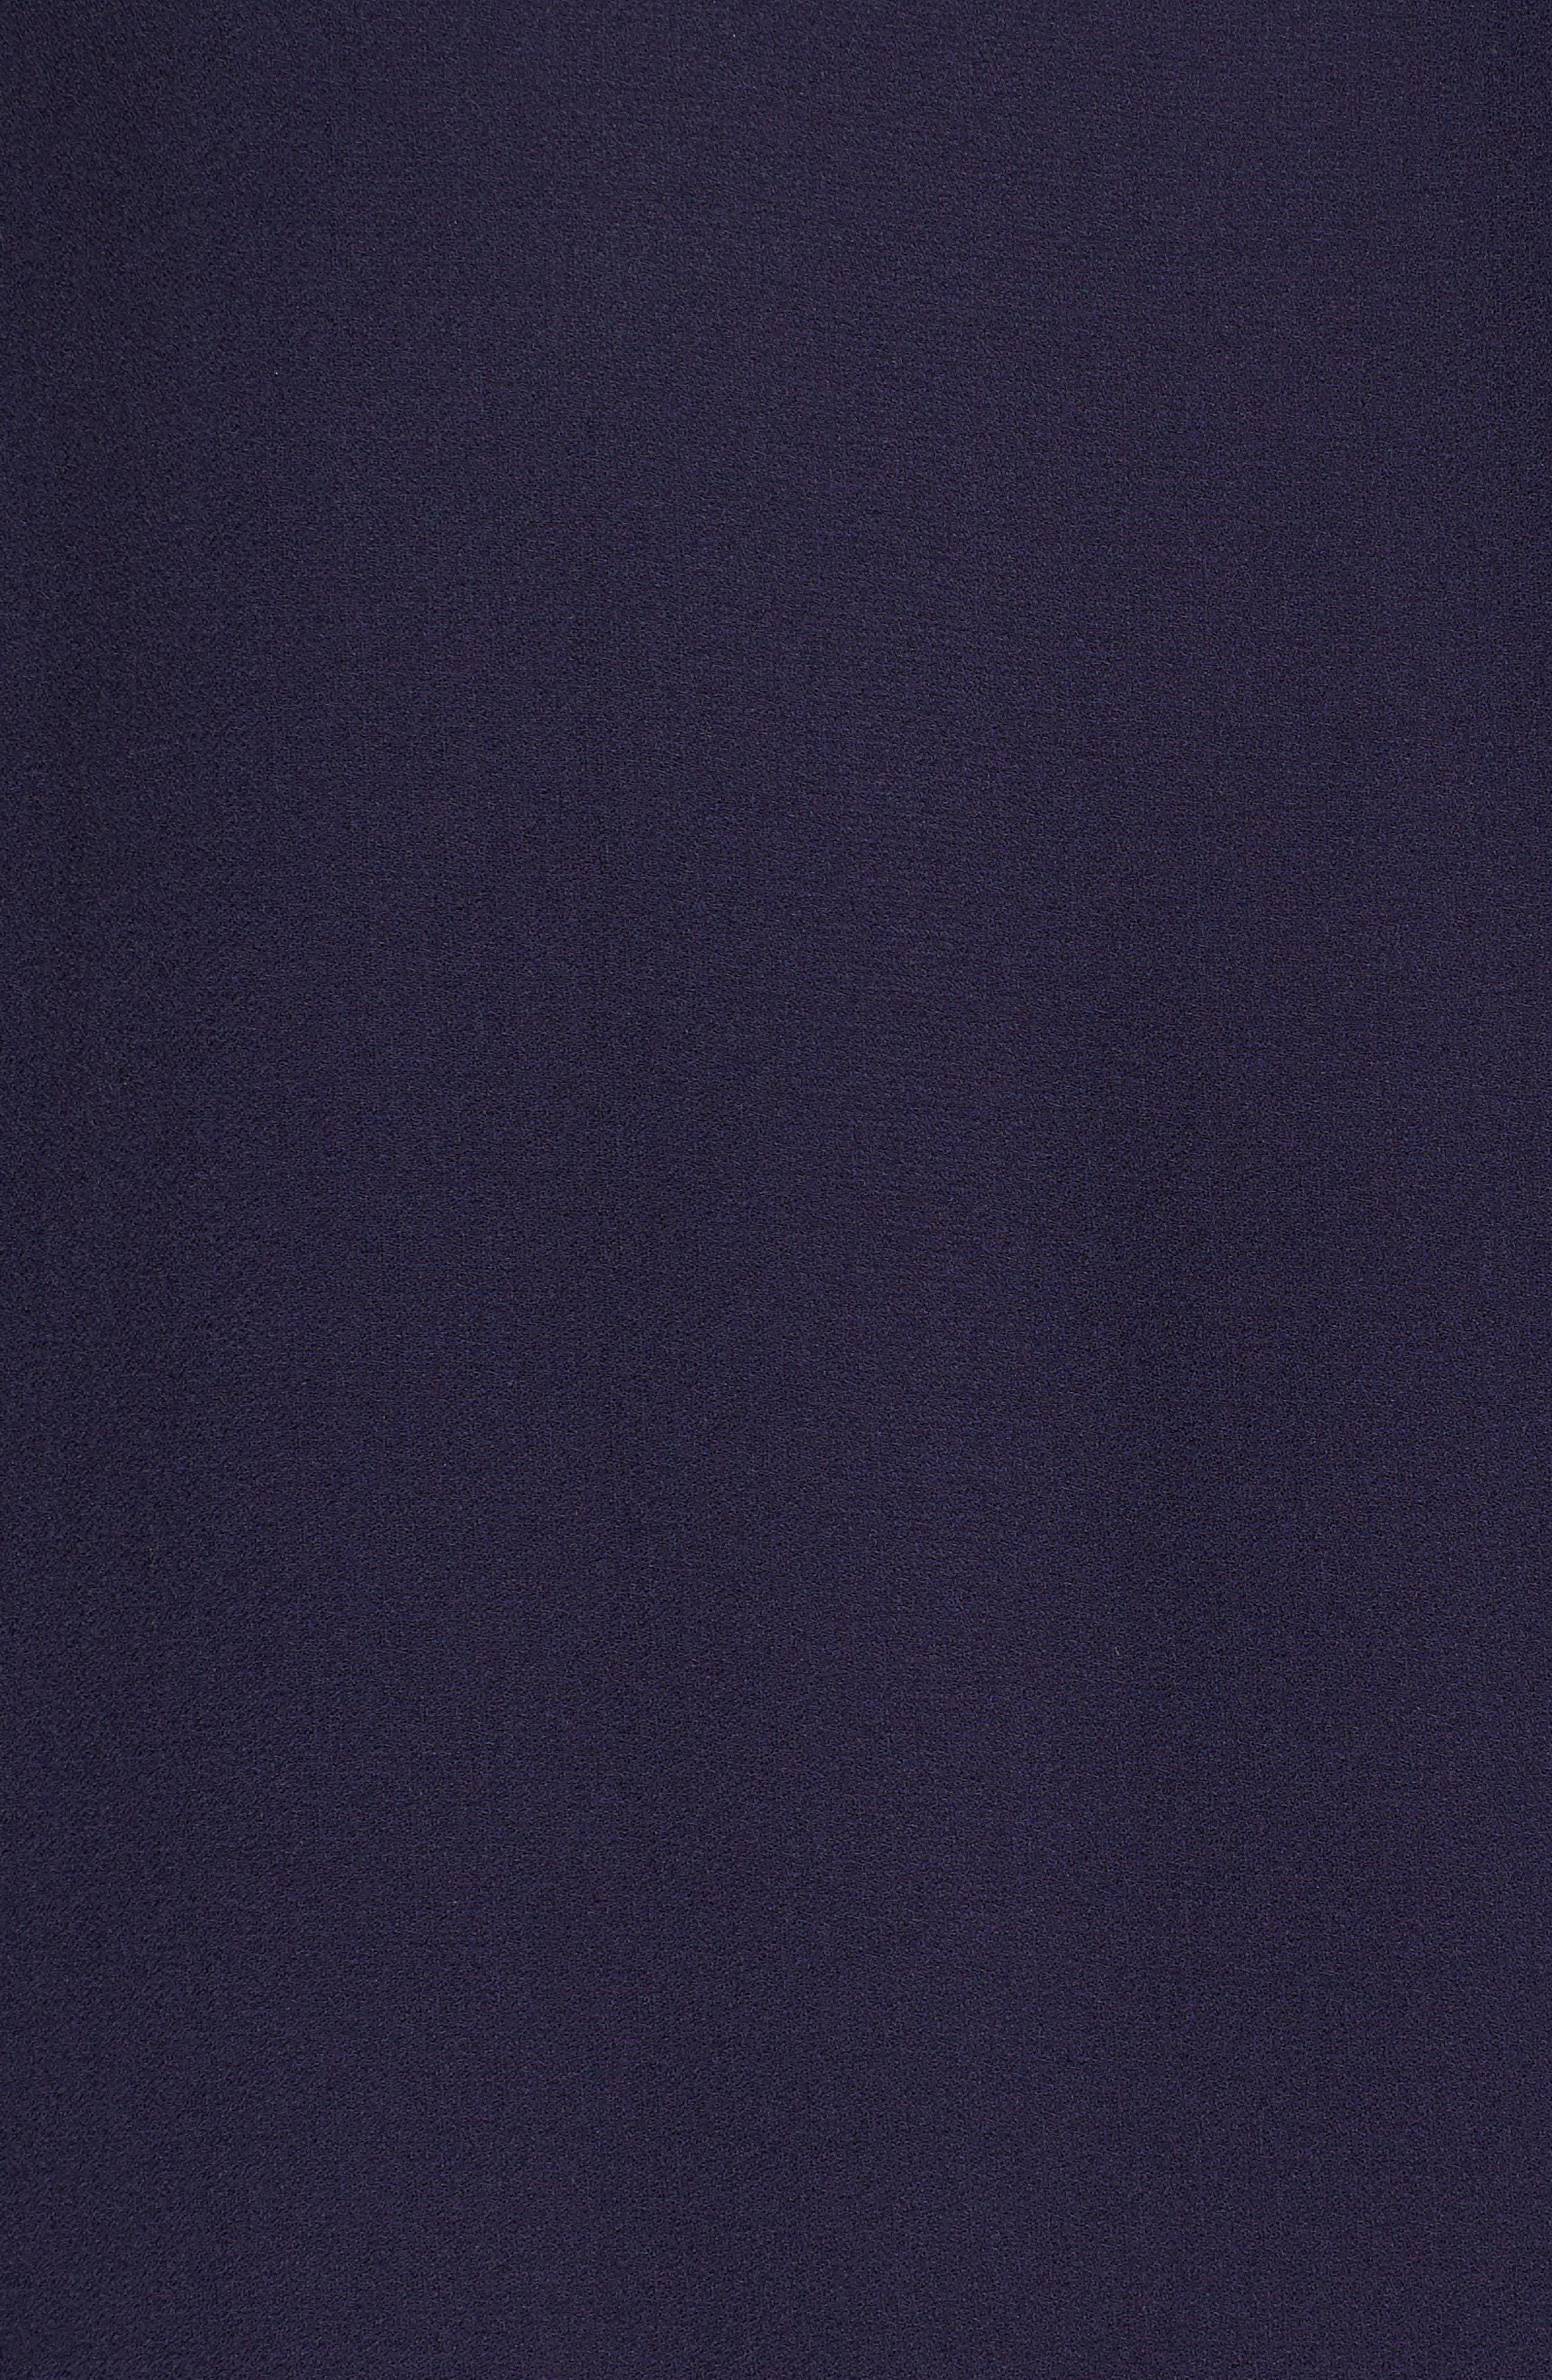 Flare Sleeve Silk Dress,                             Alternate thumbnail 5, color,                             Salt Lake